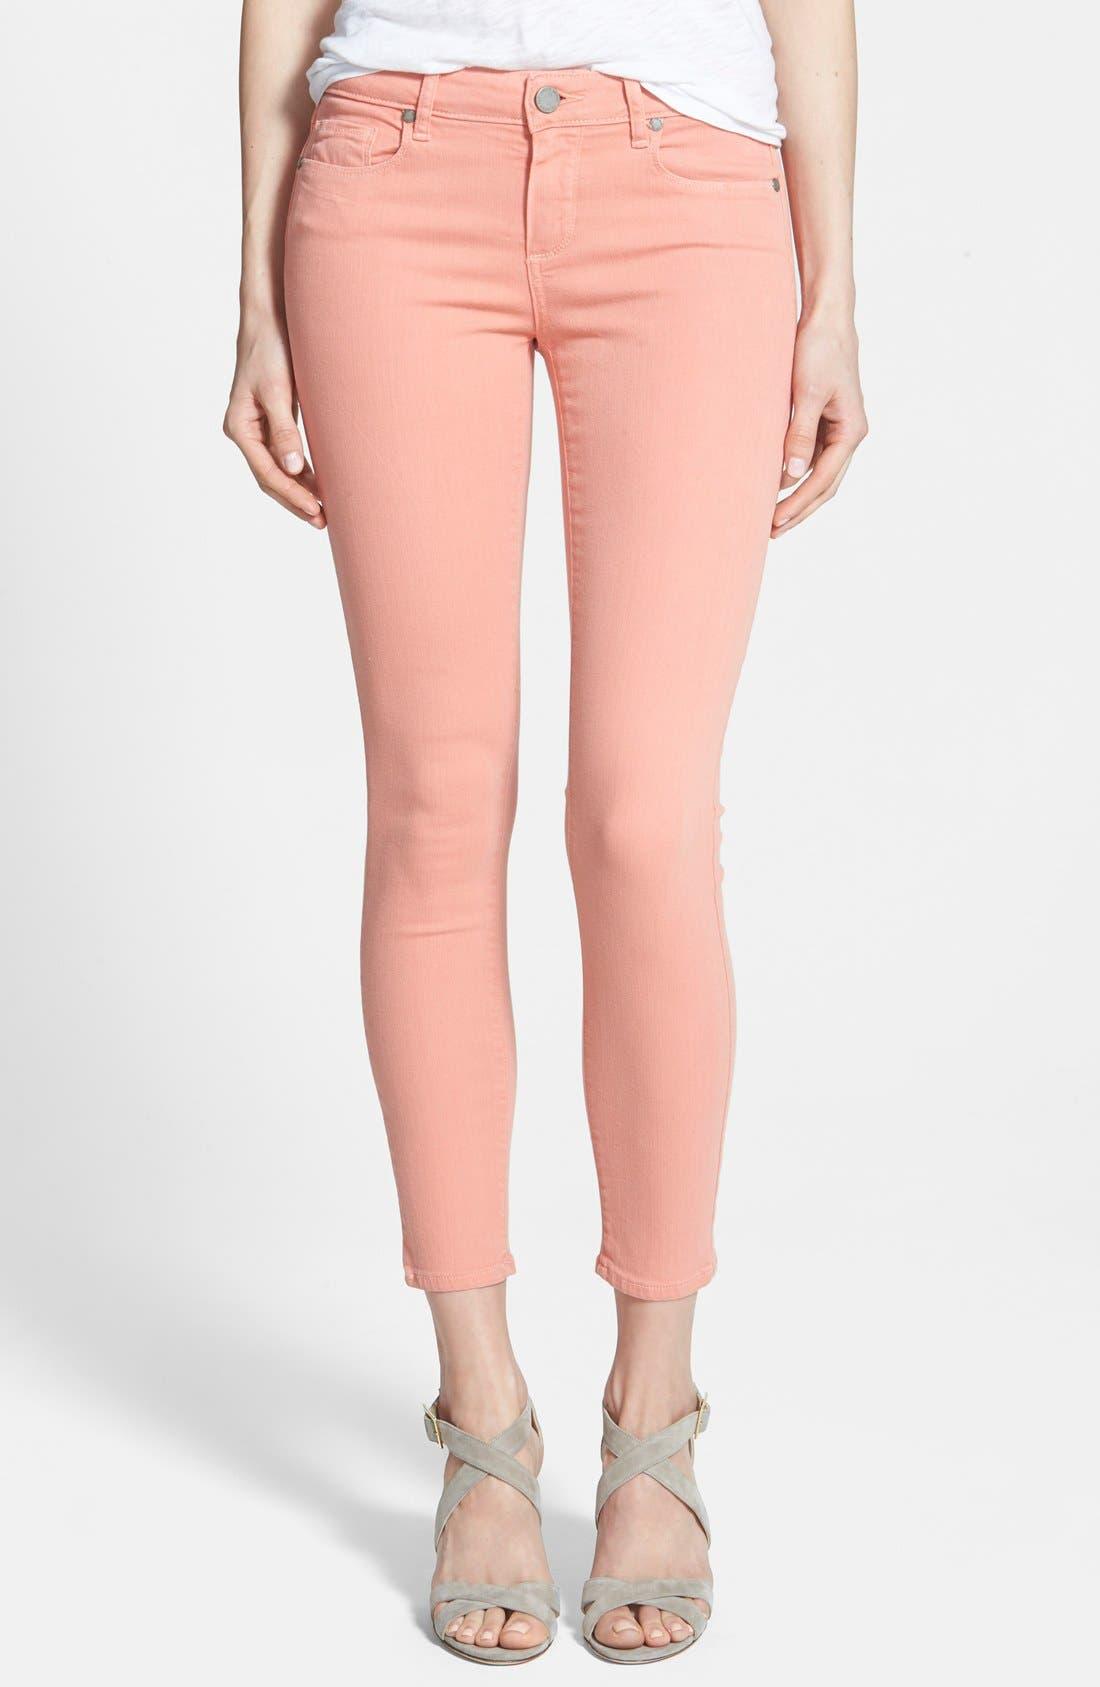 PAIGE, Denim 'Verdugo' Ankle Super Skinny Jeans, Main thumbnail 1, color, 650